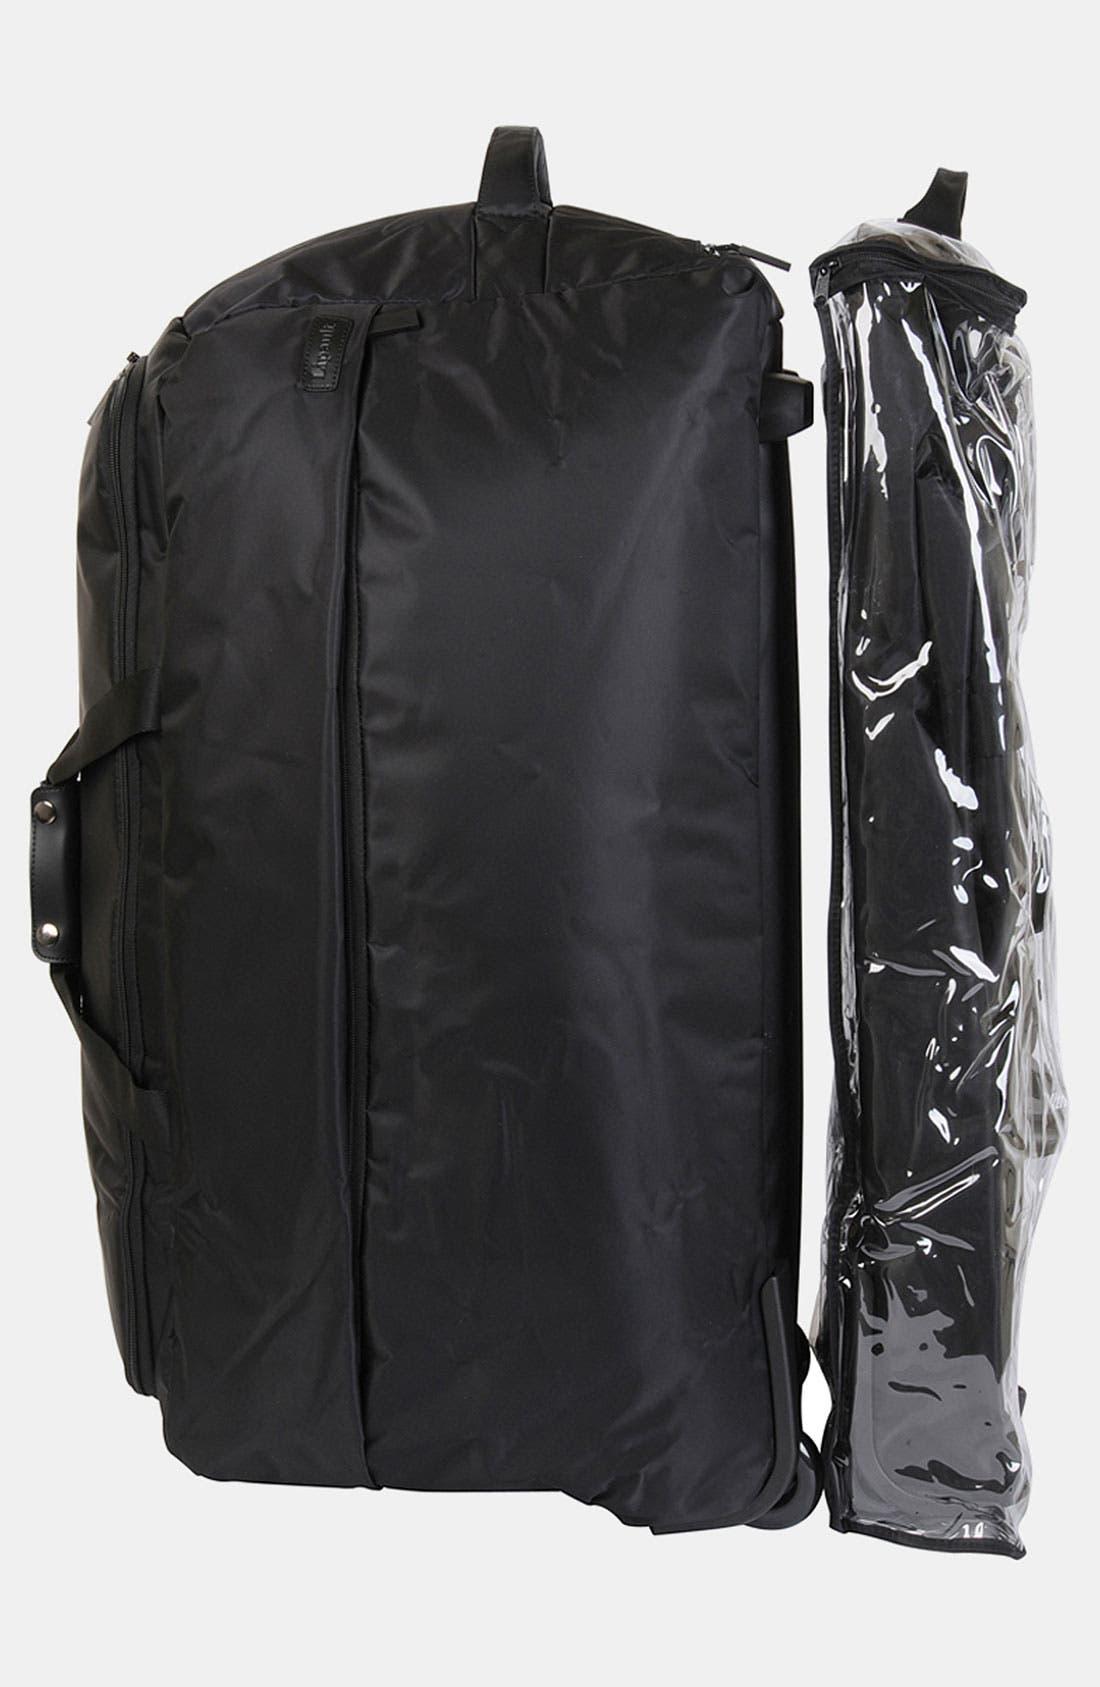 Foldable Rolling Duffel Bag,                             Alternate thumbnail 2, color,                             001